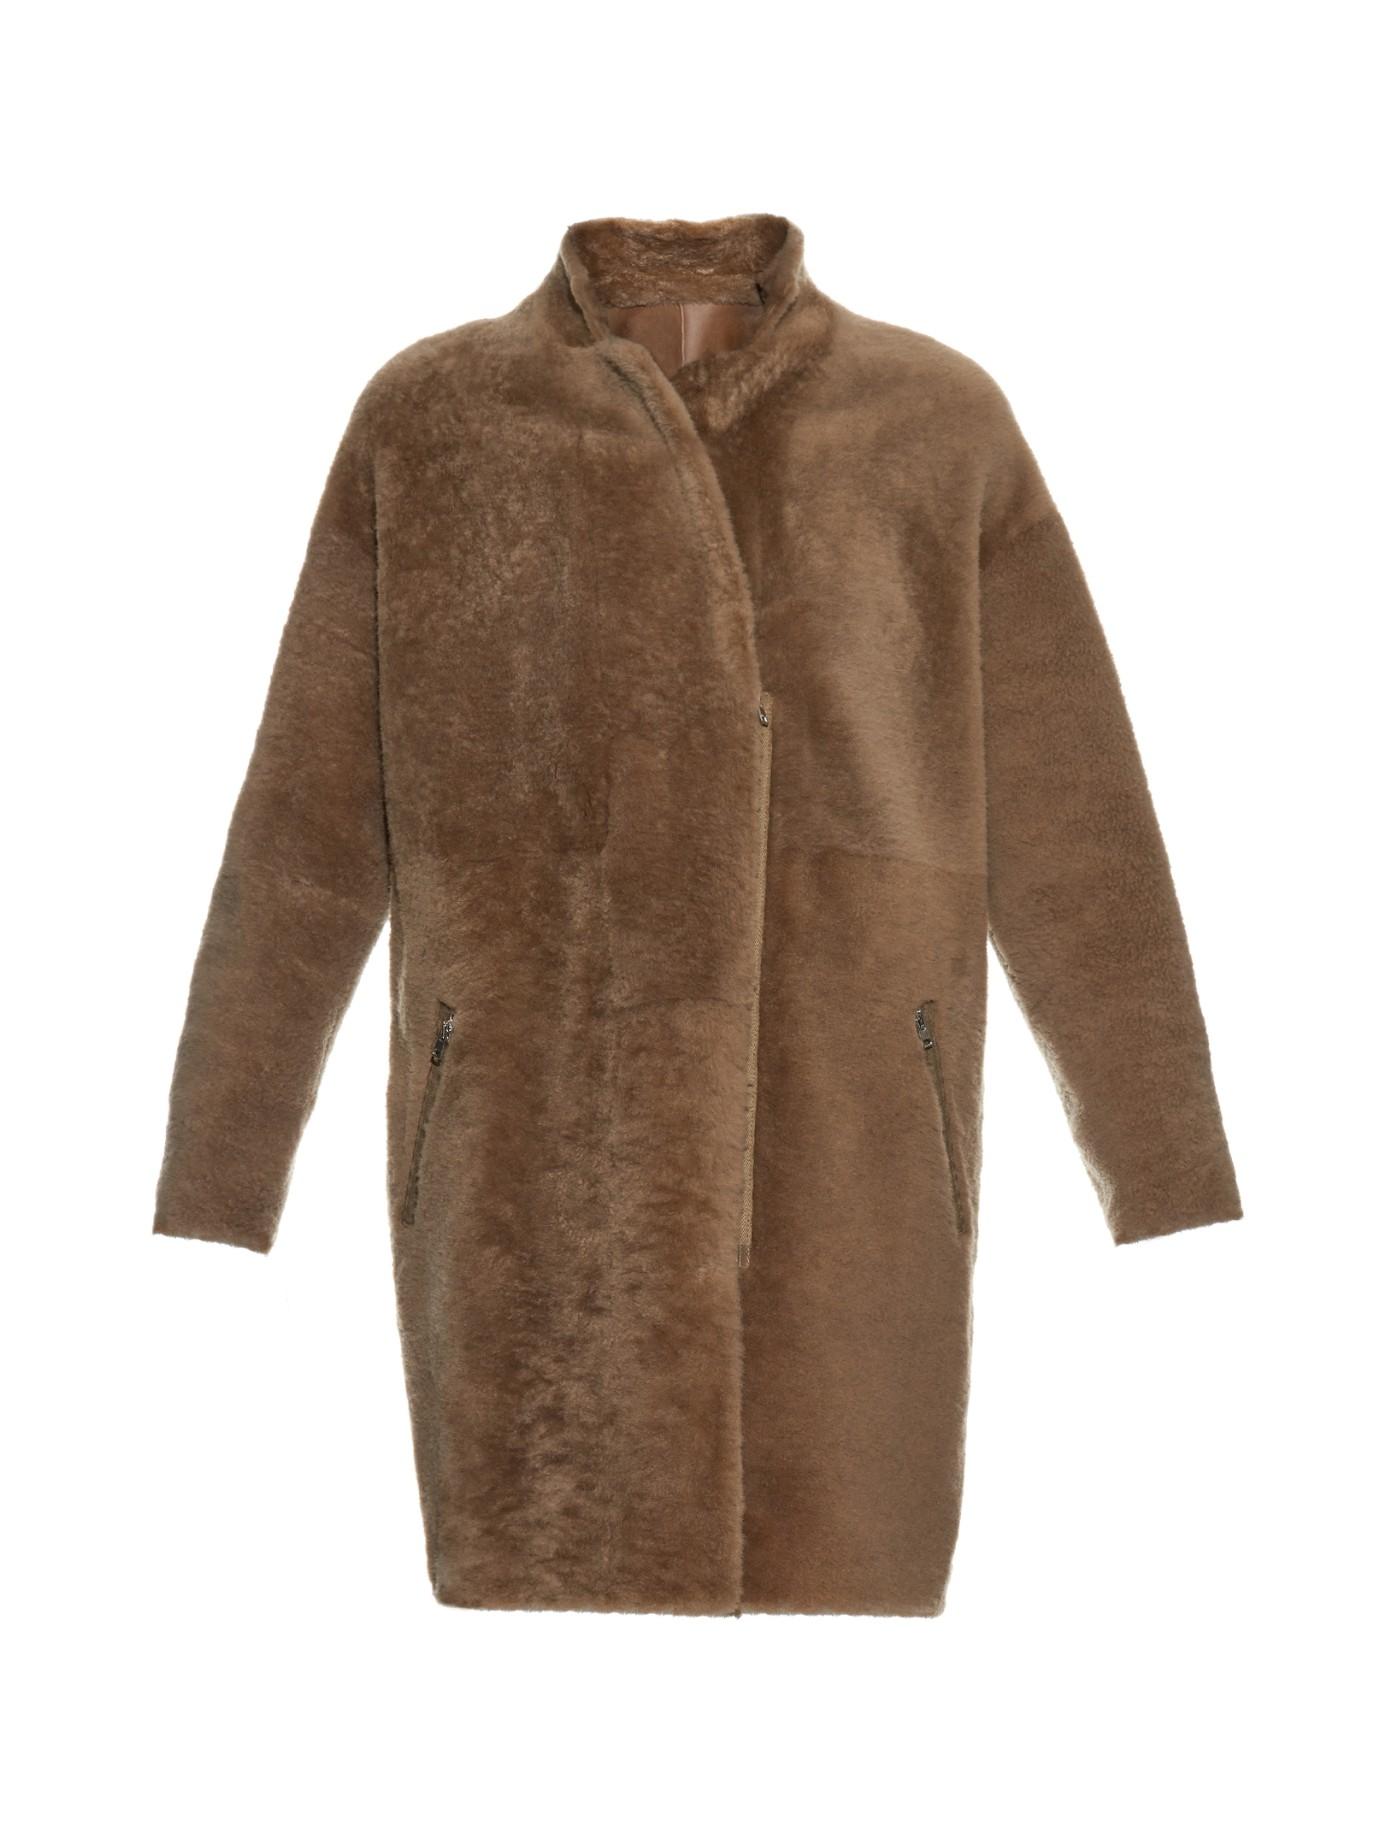 32 paradis sprung freres reversible shearling coat in